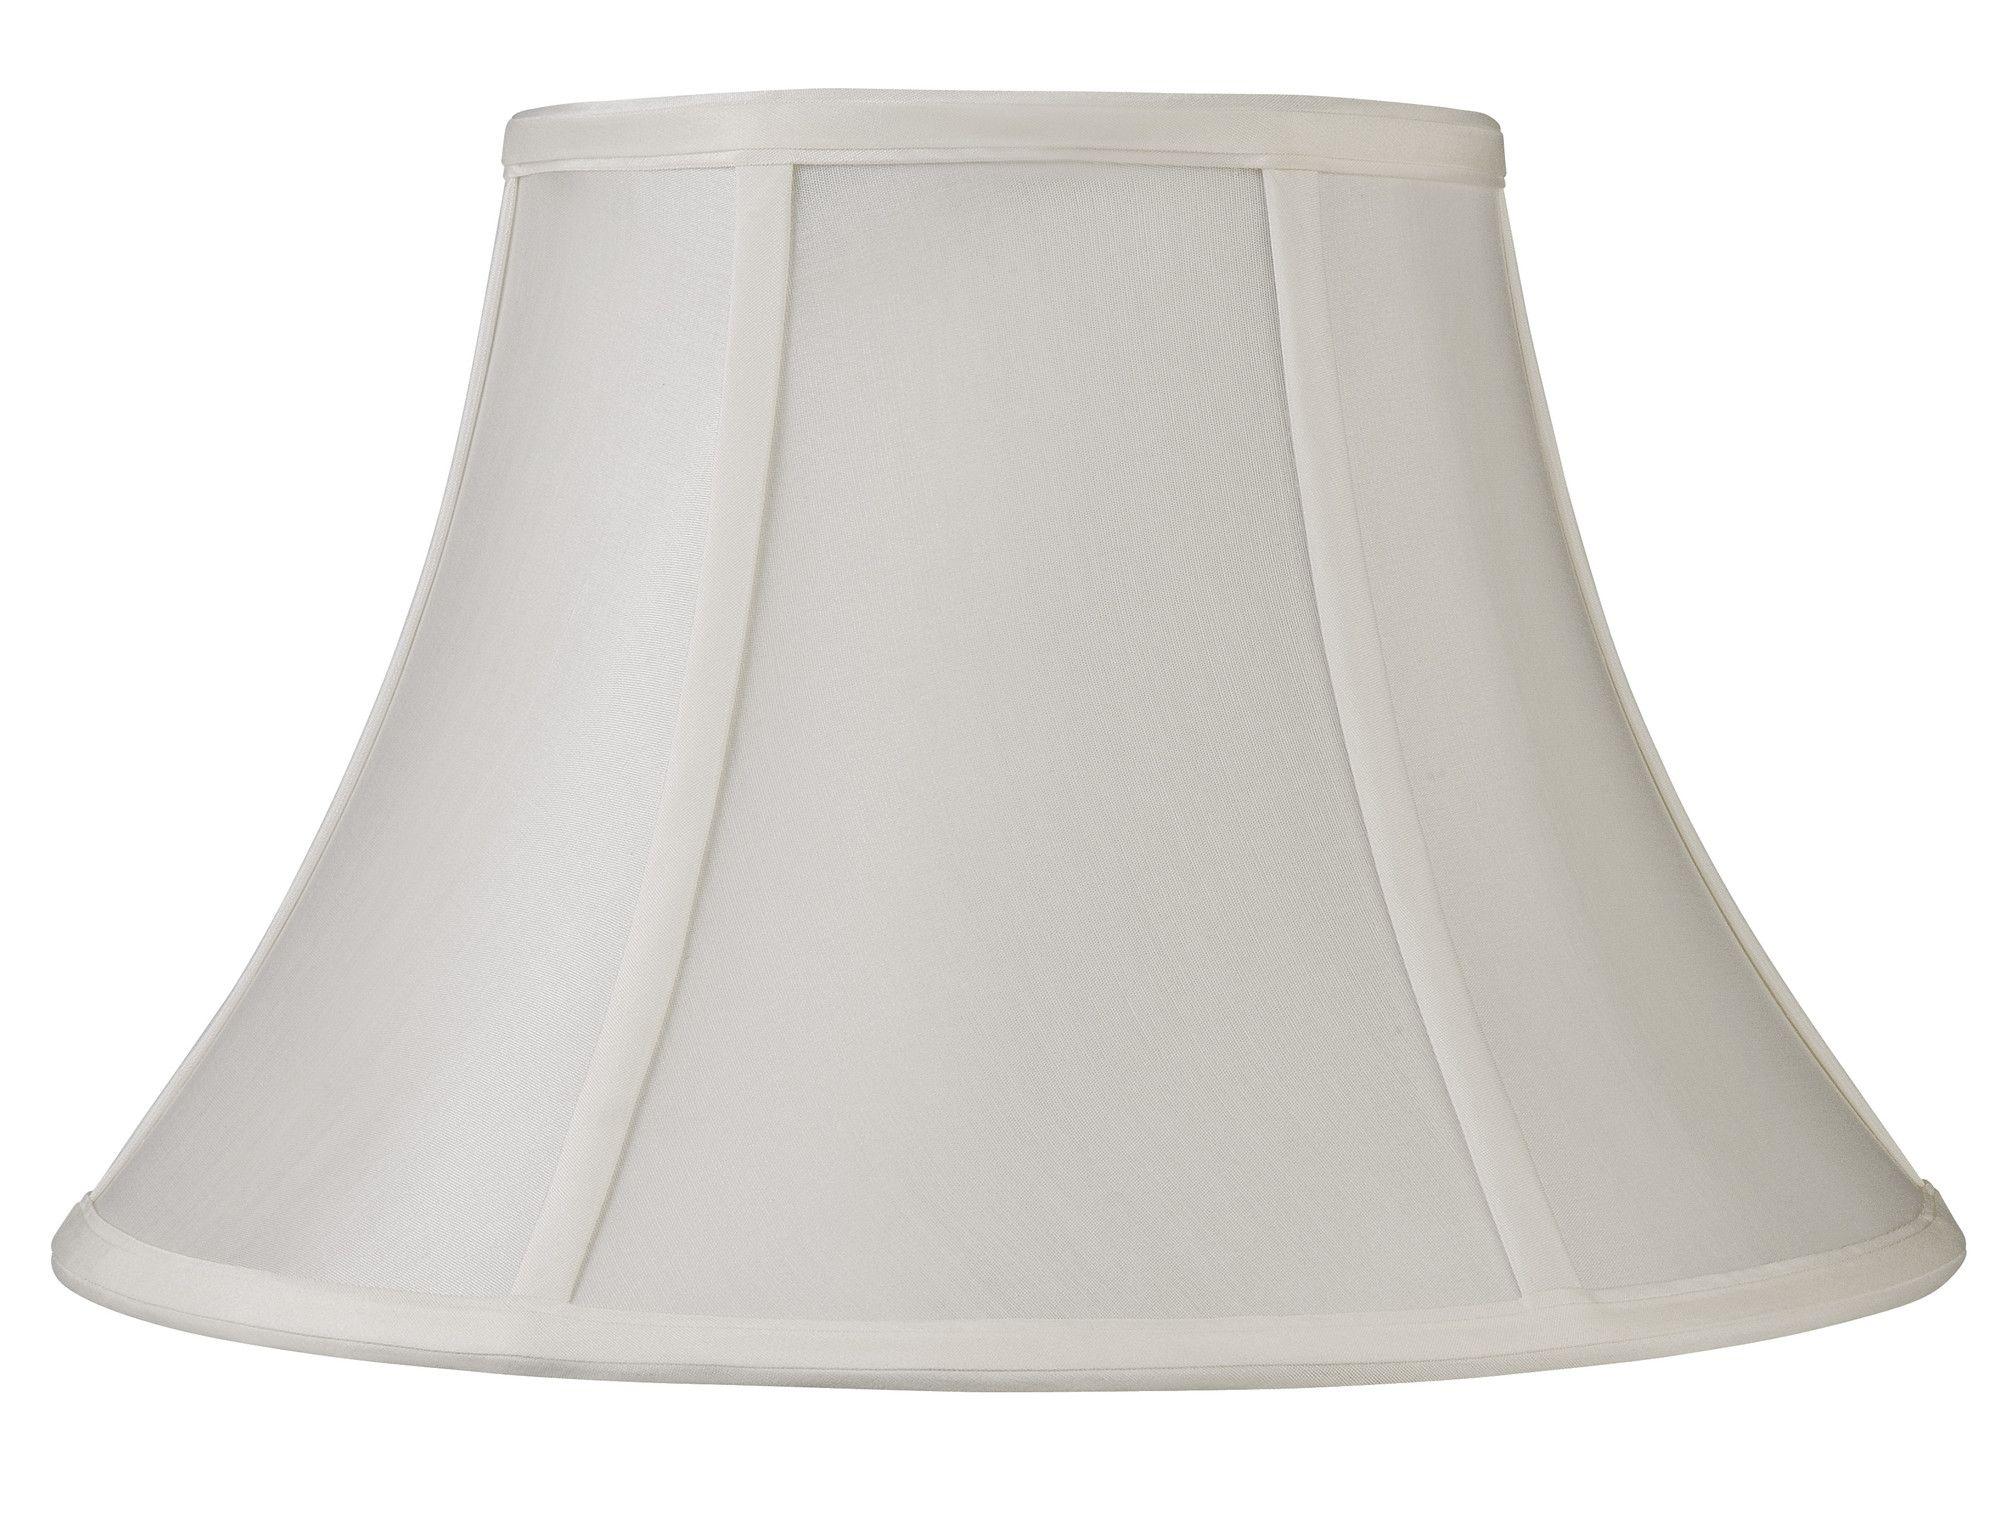 14 classic silk empire lamp shade wayfair lampshades 14 classic silk empire lamp shade wayfair aloadofball Images